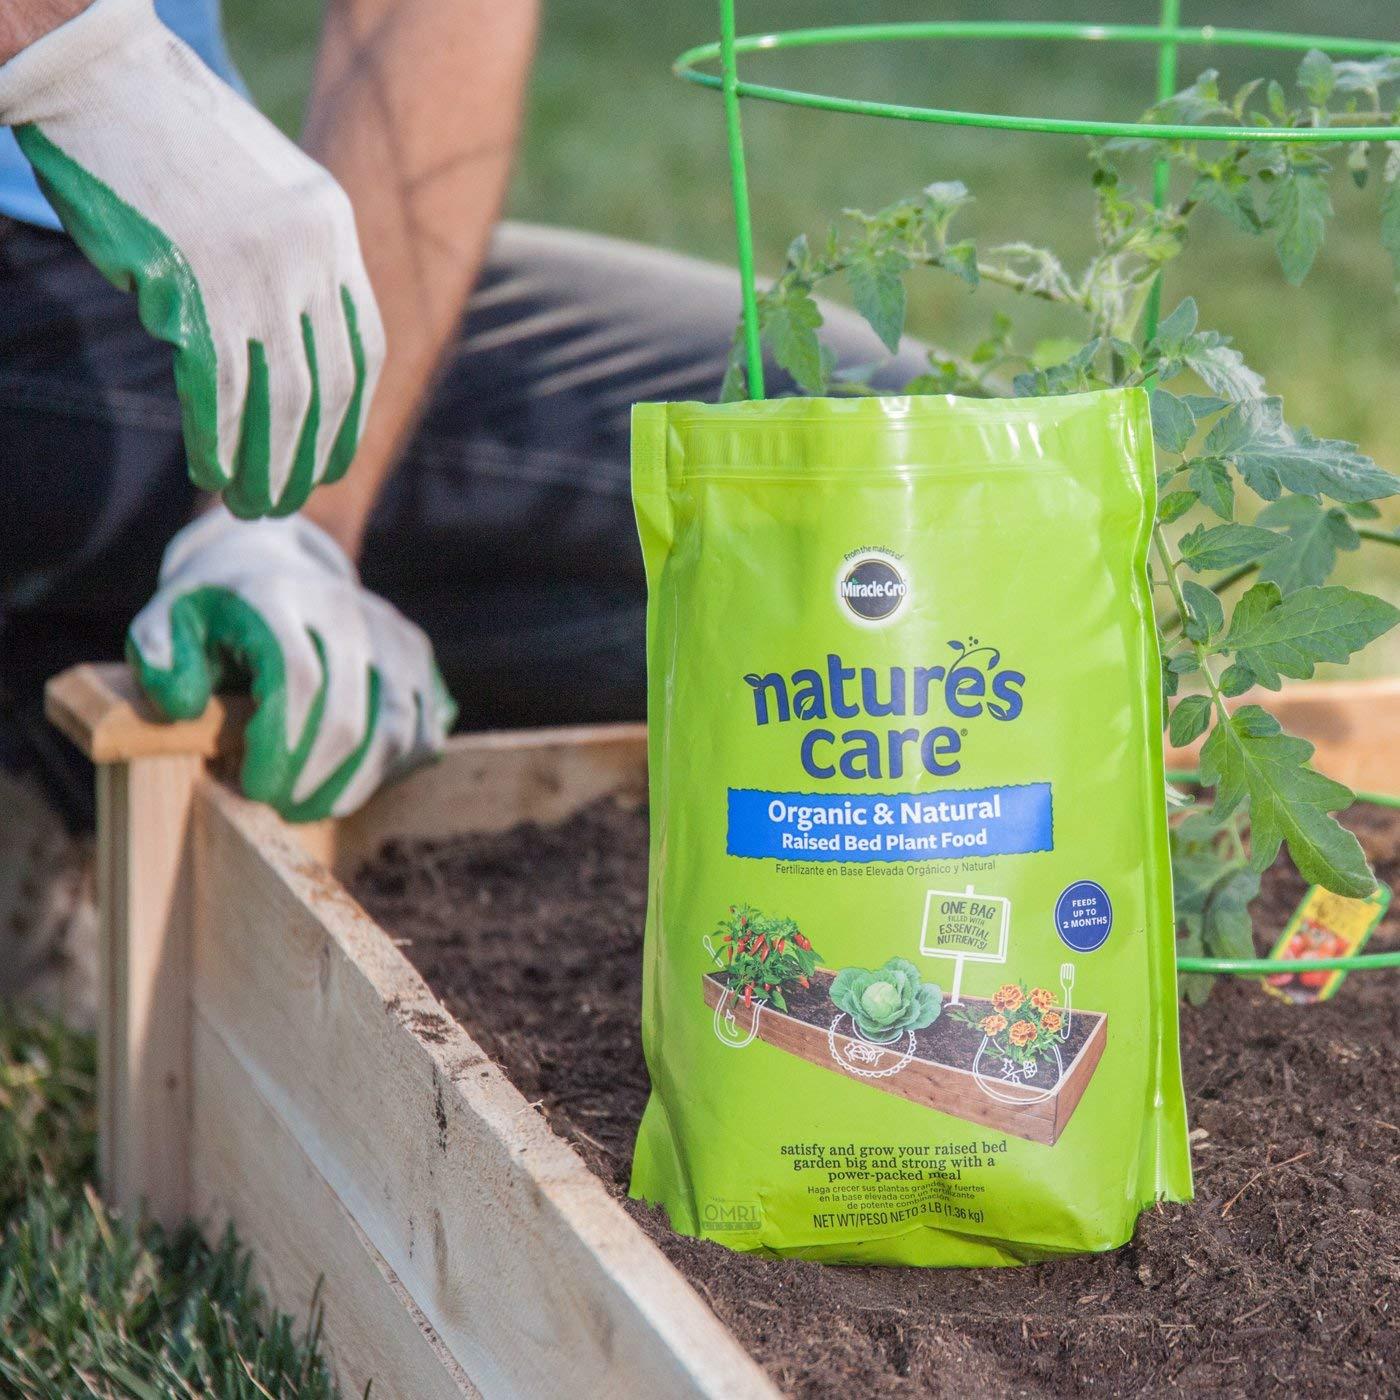 Amazon.com: Natures Care Organic & Natural Raised Bed Plant Food (Fоur Расk): Garden & Outdoor